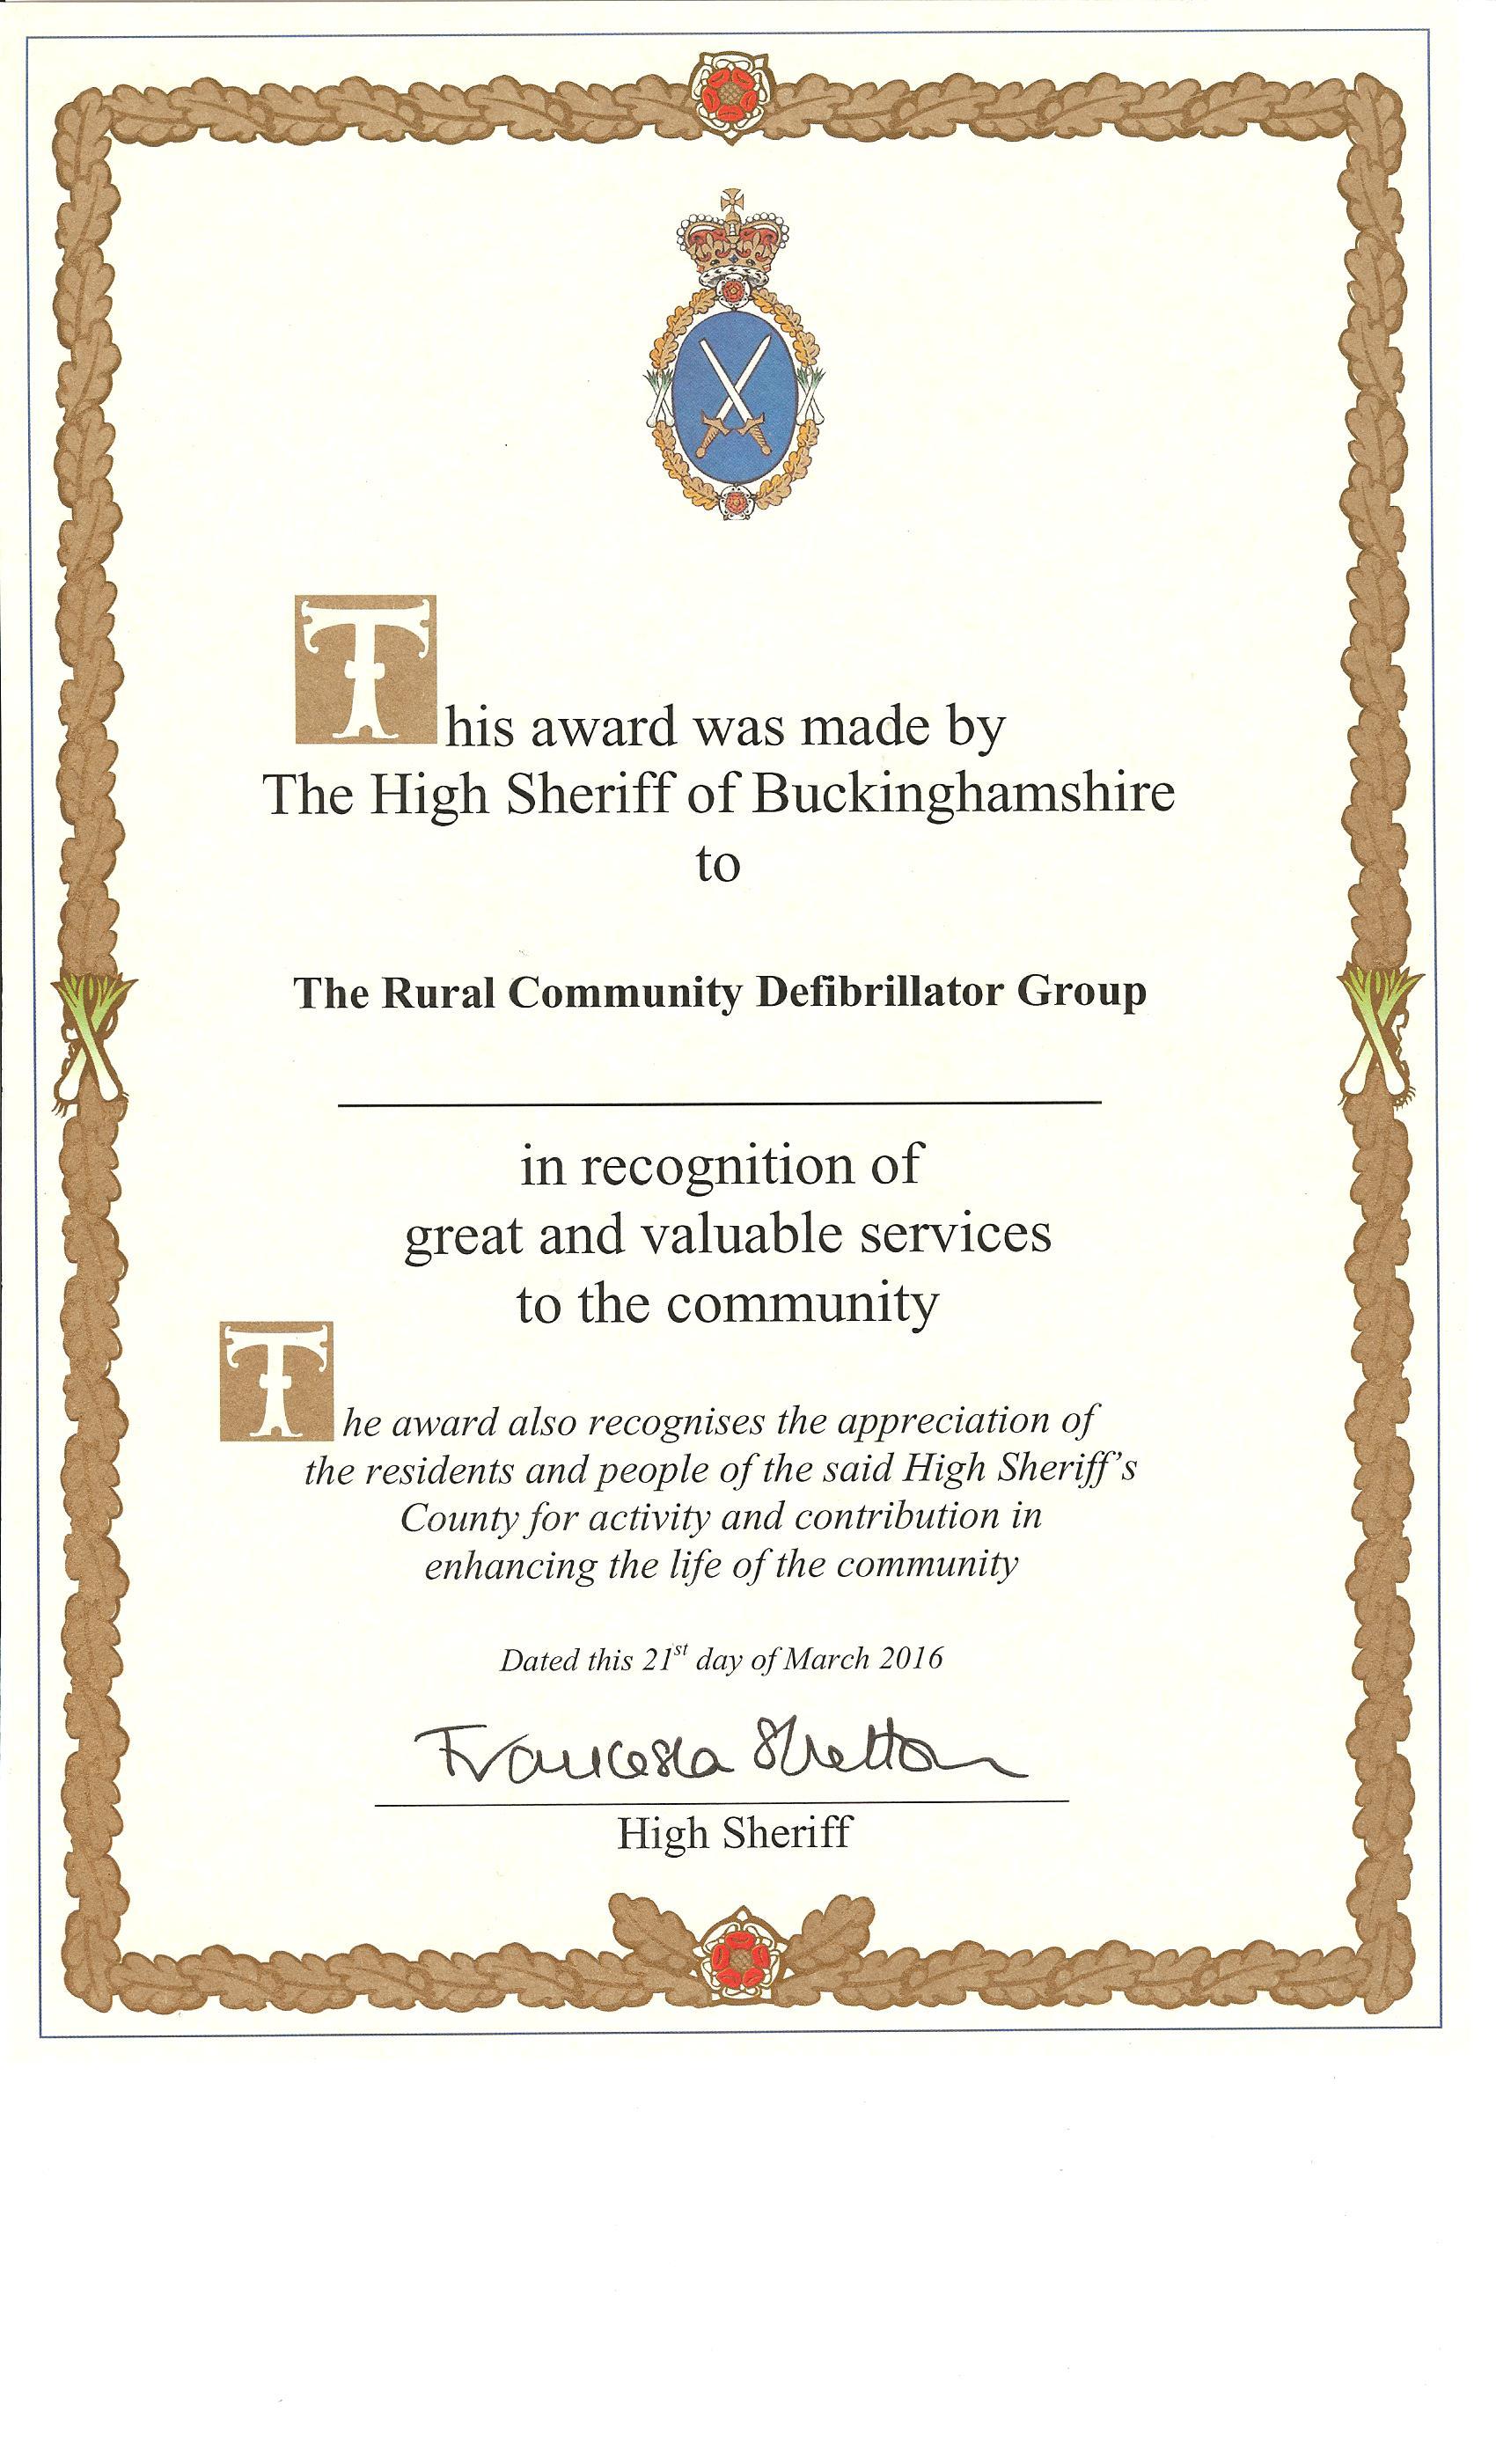 RCDG High Sheriff certificate